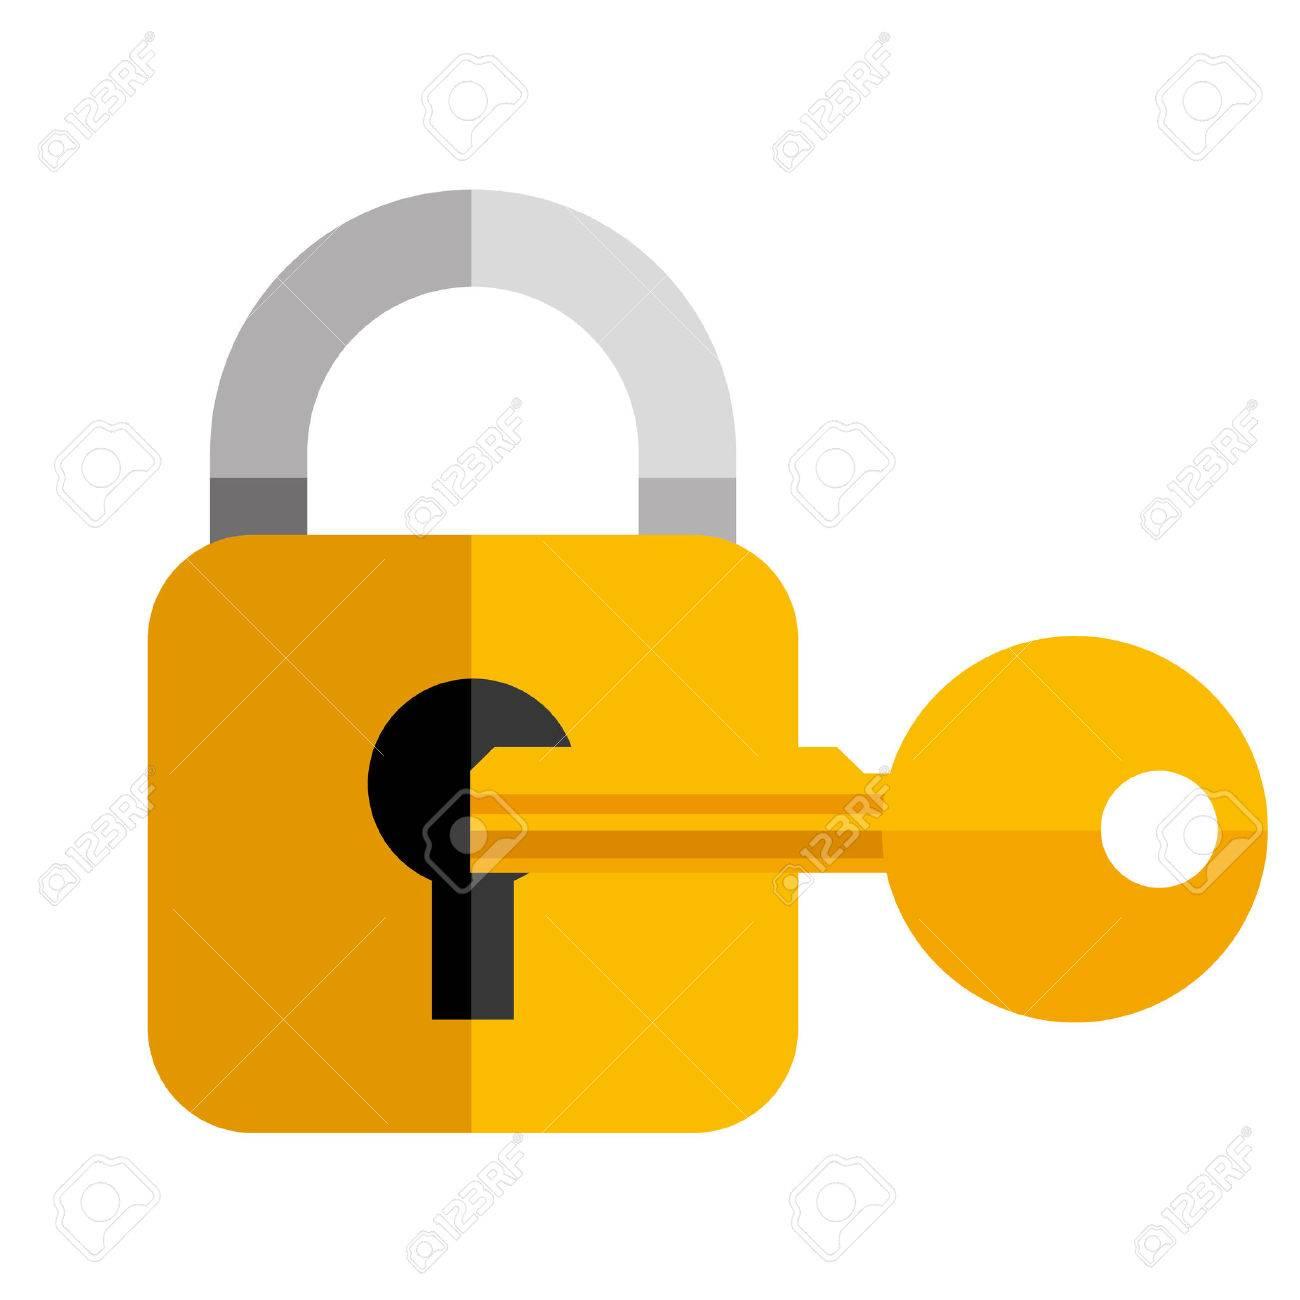 secutiy lock key object icon vector illustration - 59901132